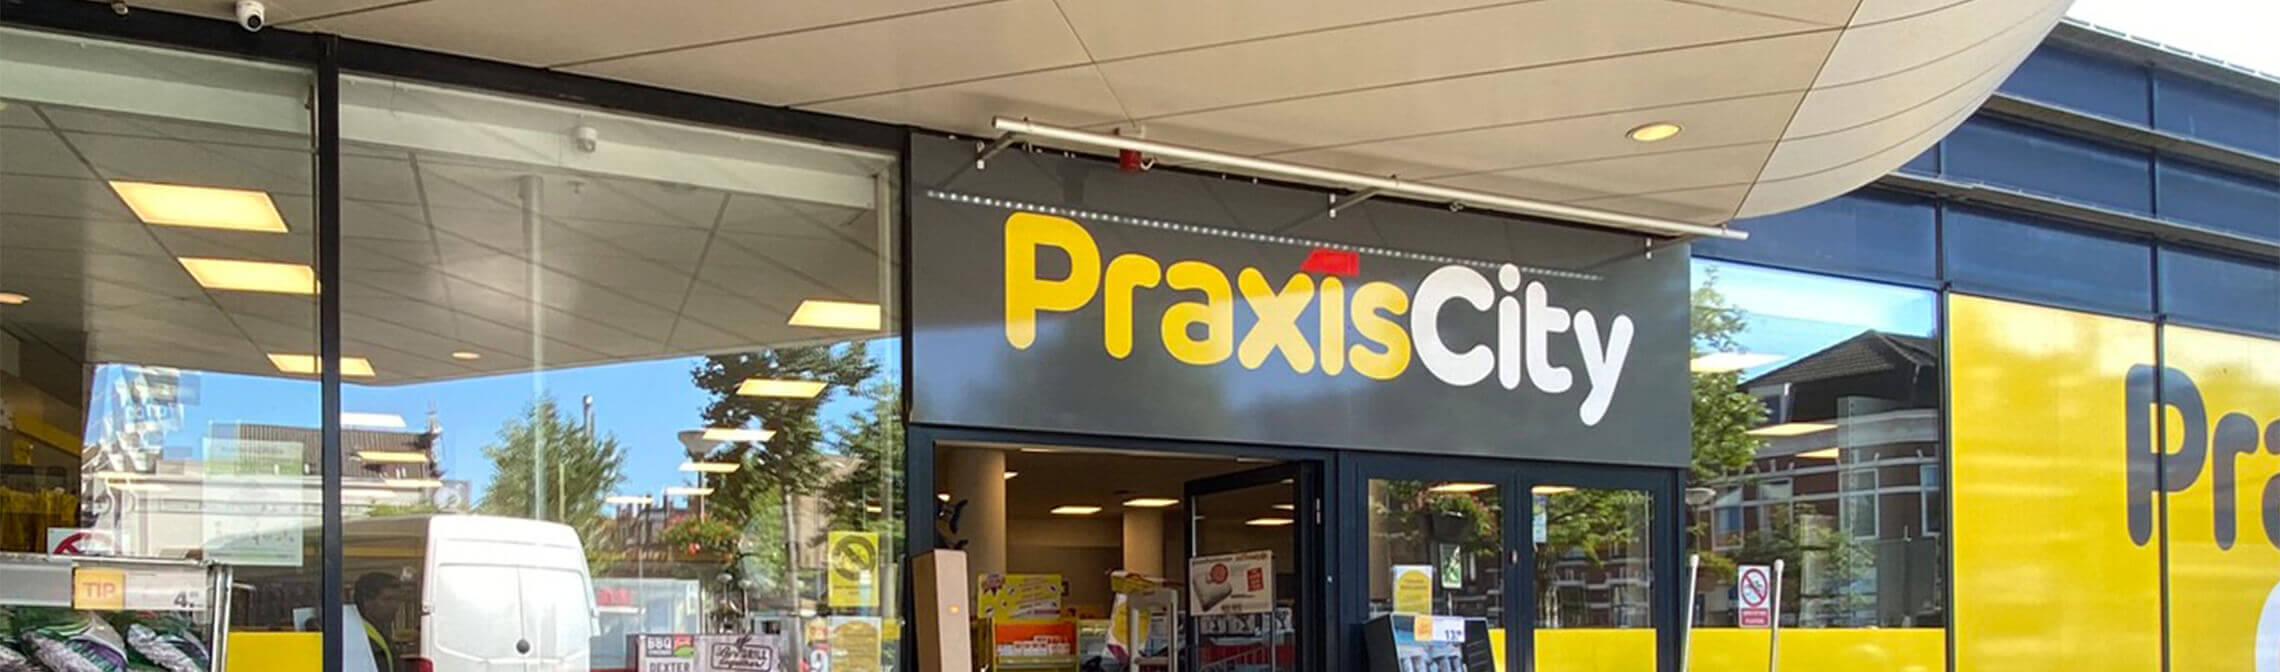 Praxis City Header